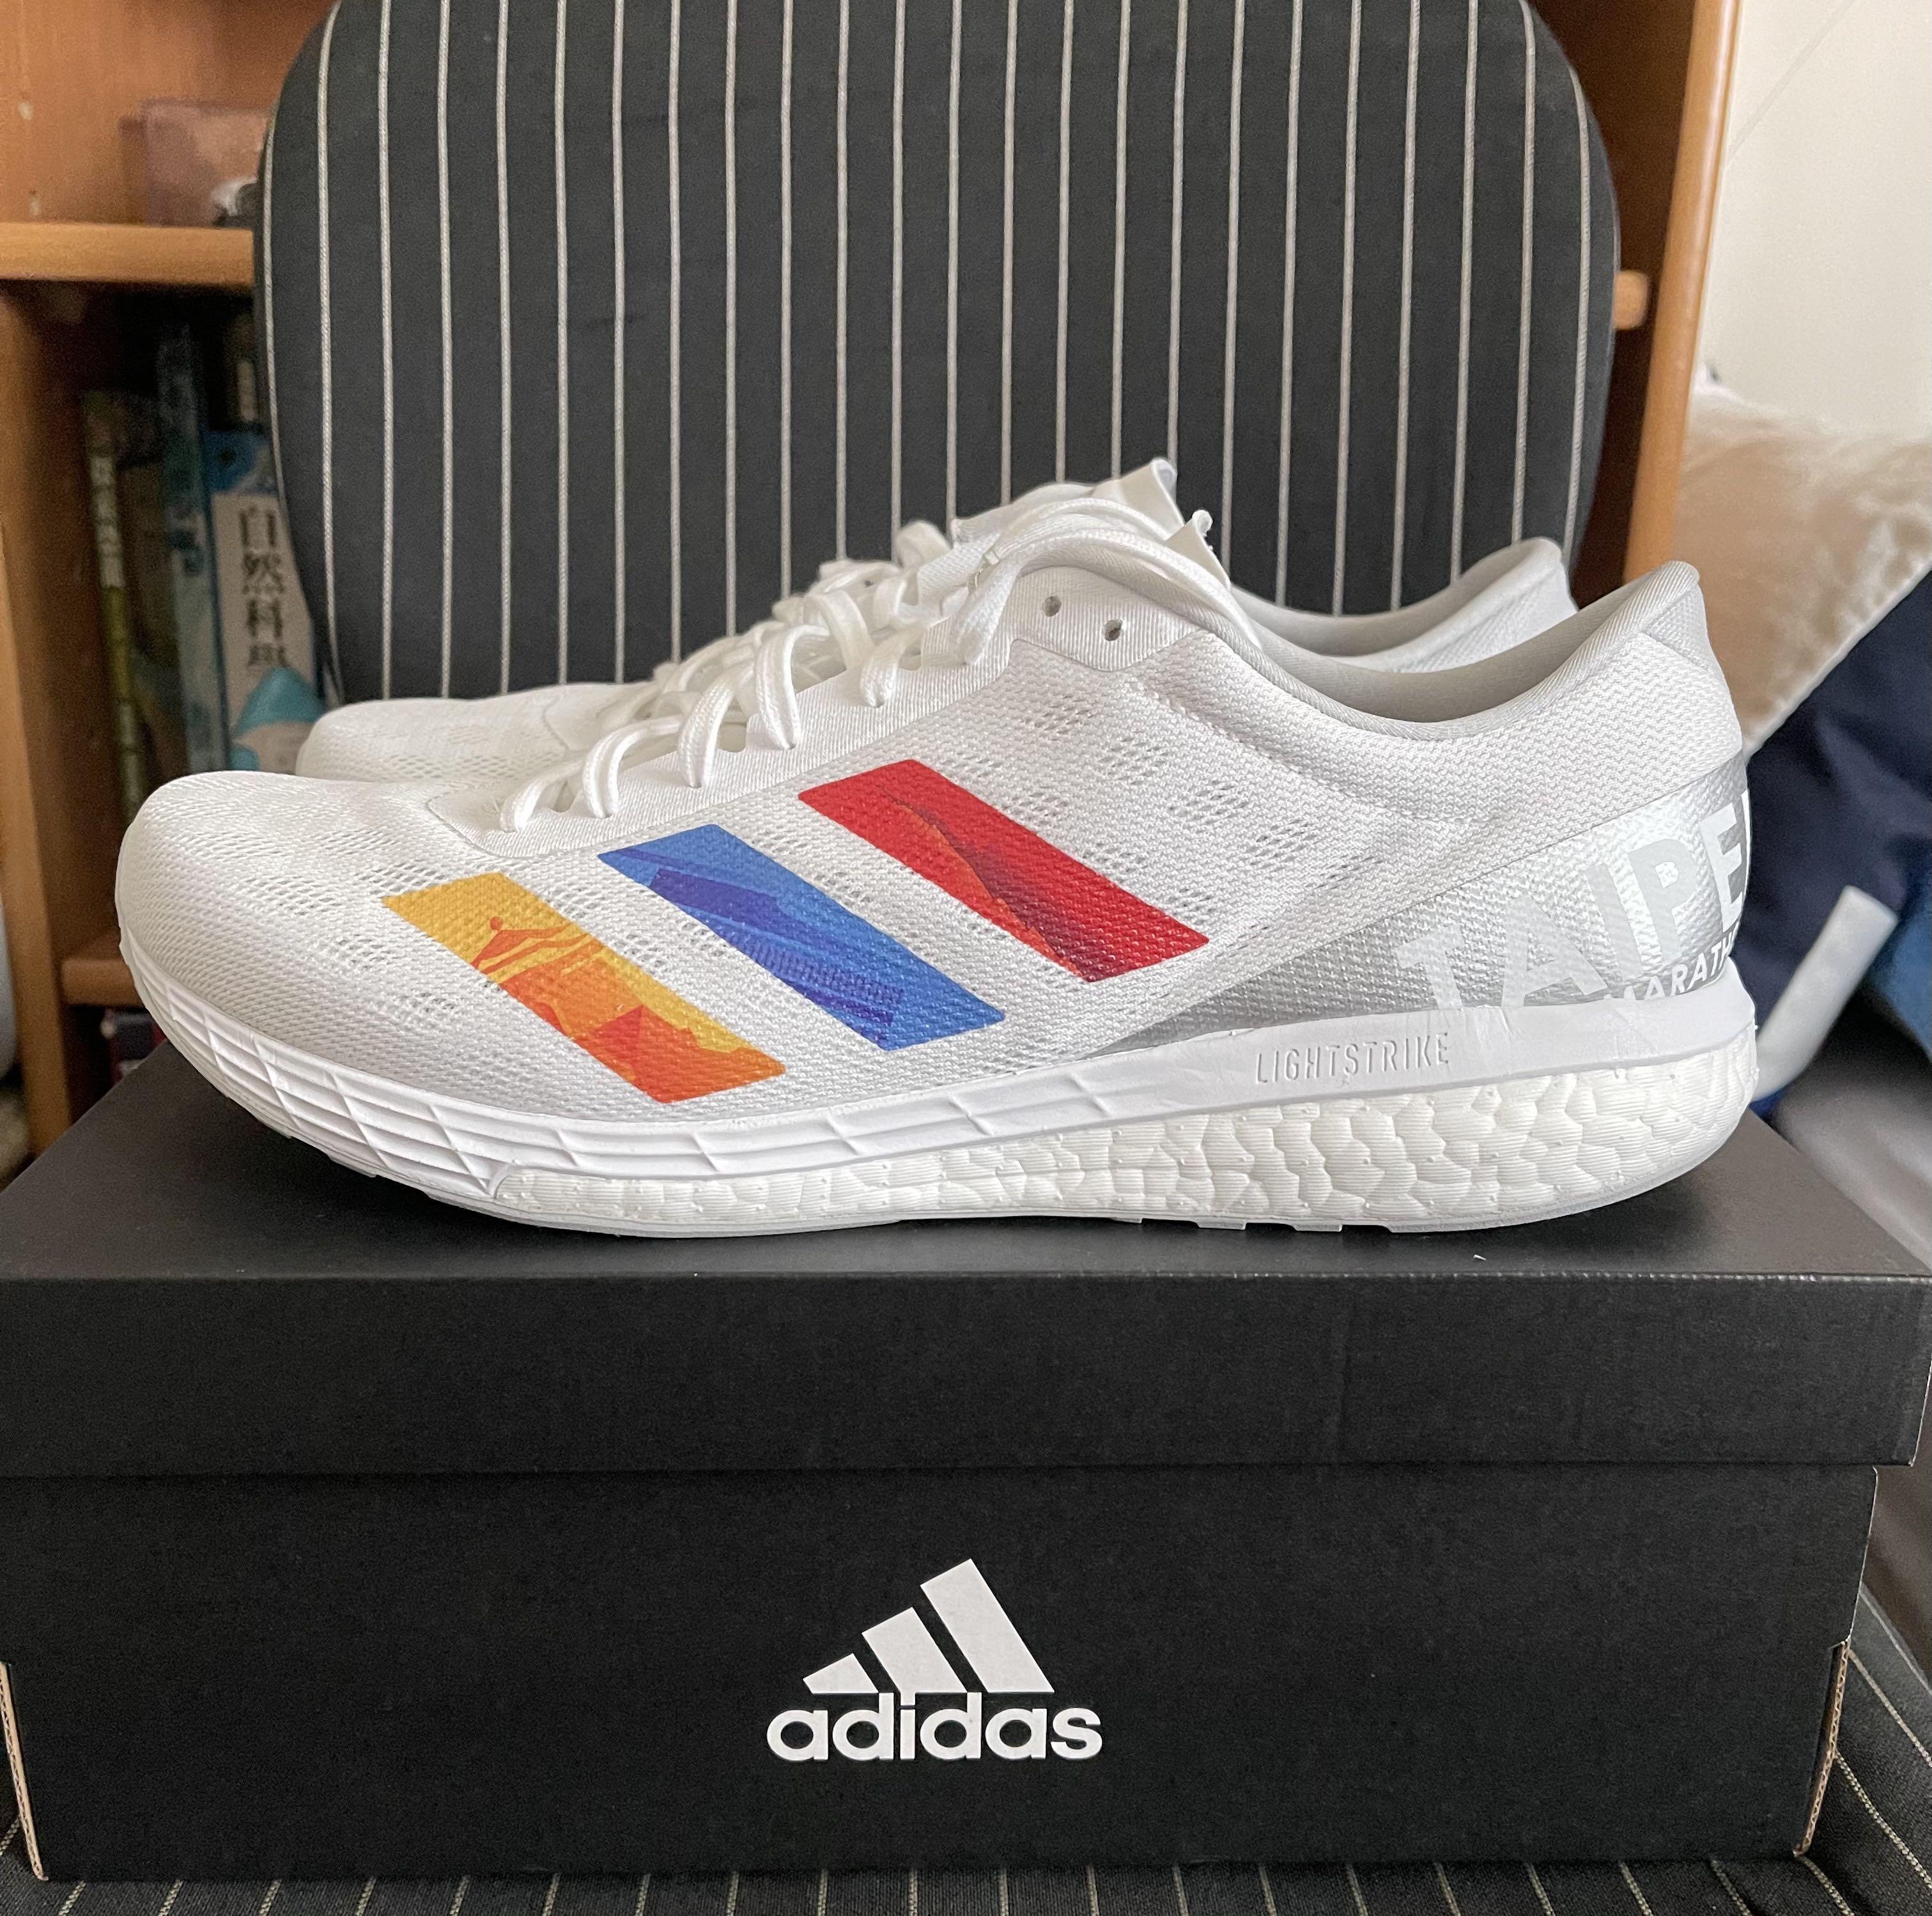 Adidas Adizero Boston 9 台北城市限定款 慢跑鞋 馬拉松